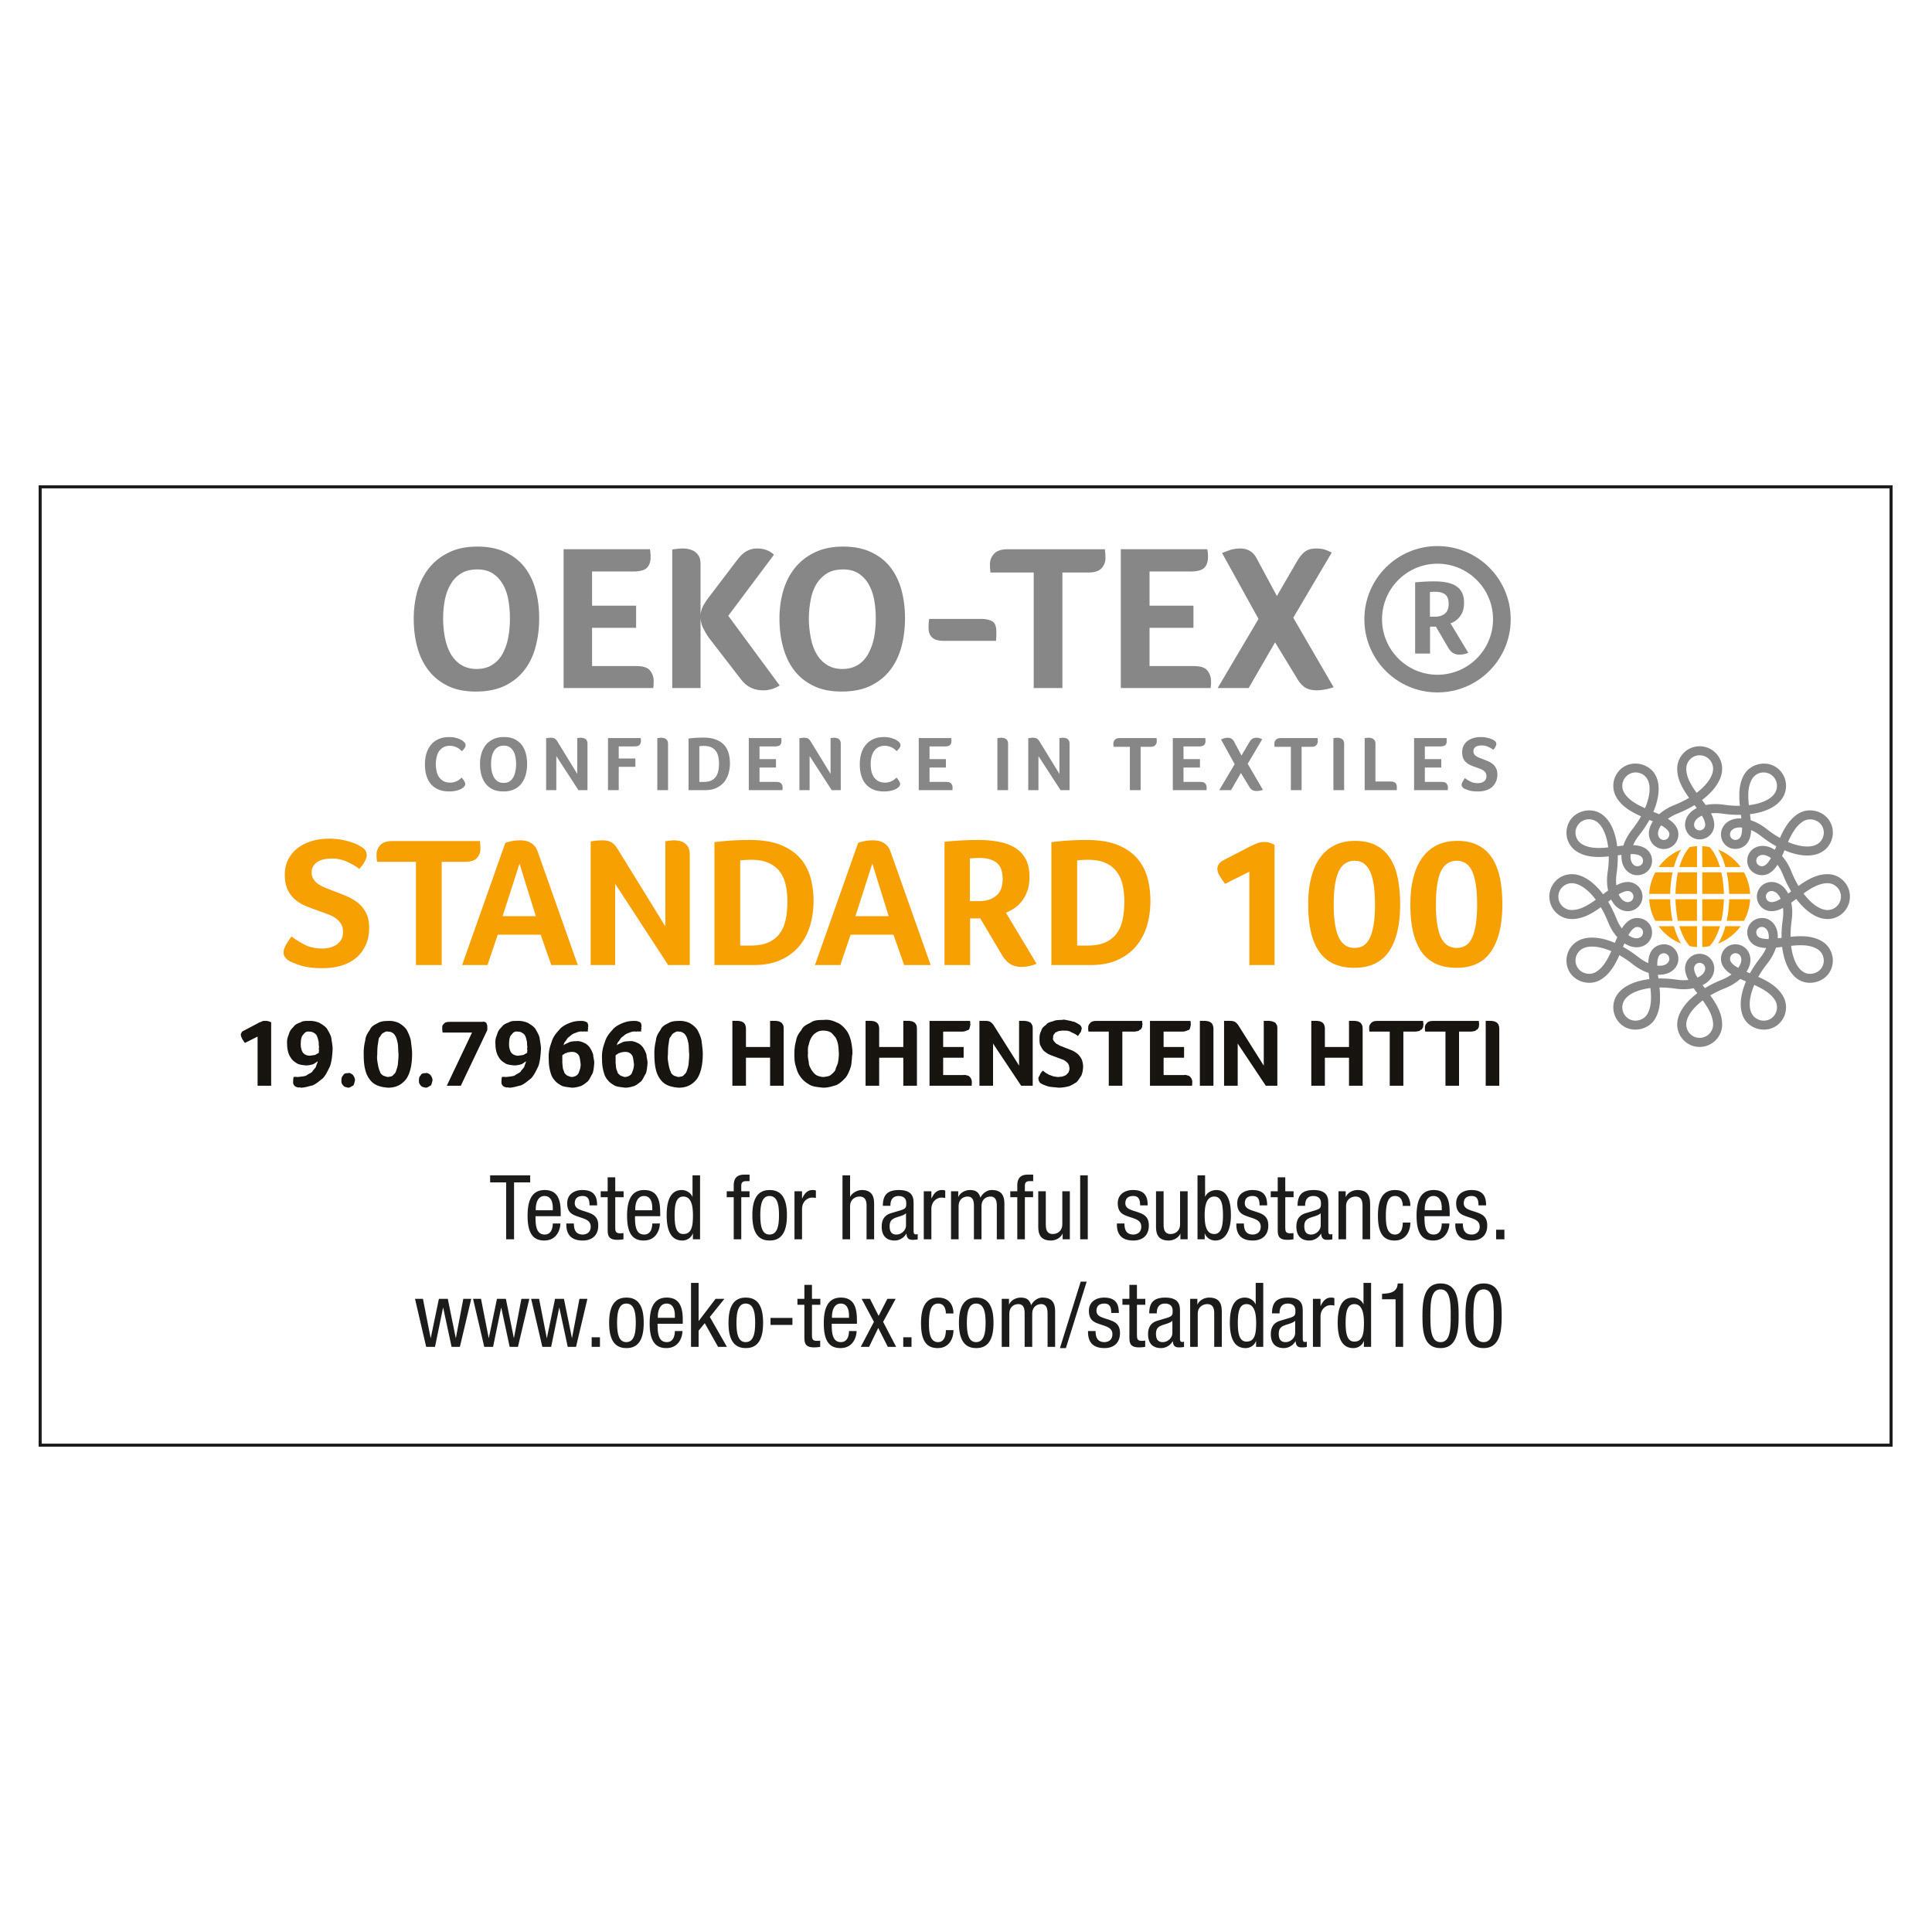 Apron - small 180g Eco tex standard 100